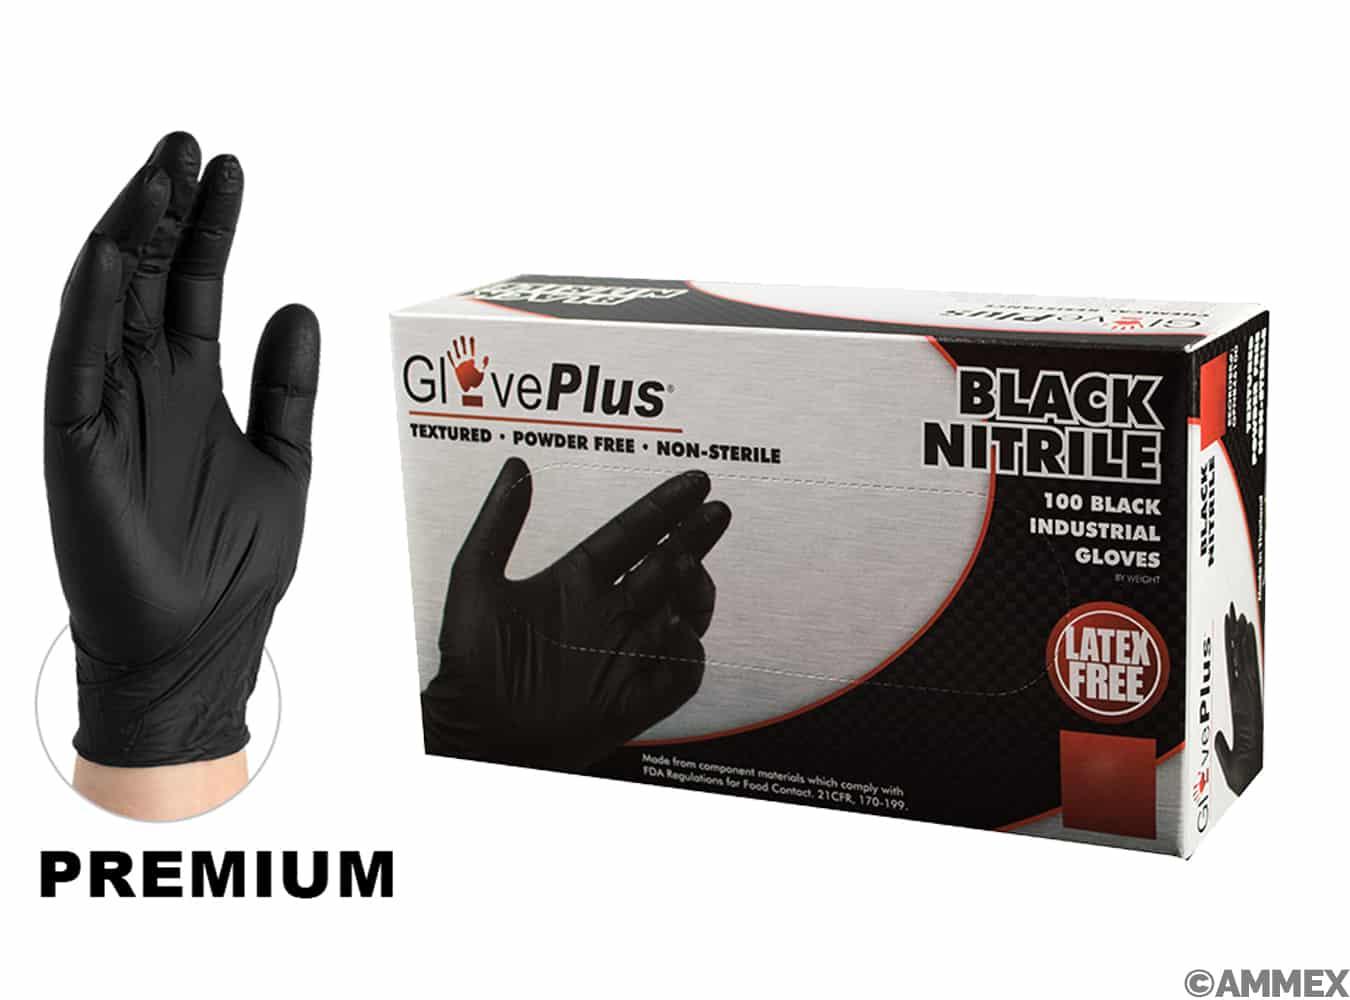 GlovePlus Black Nitrile Gloves